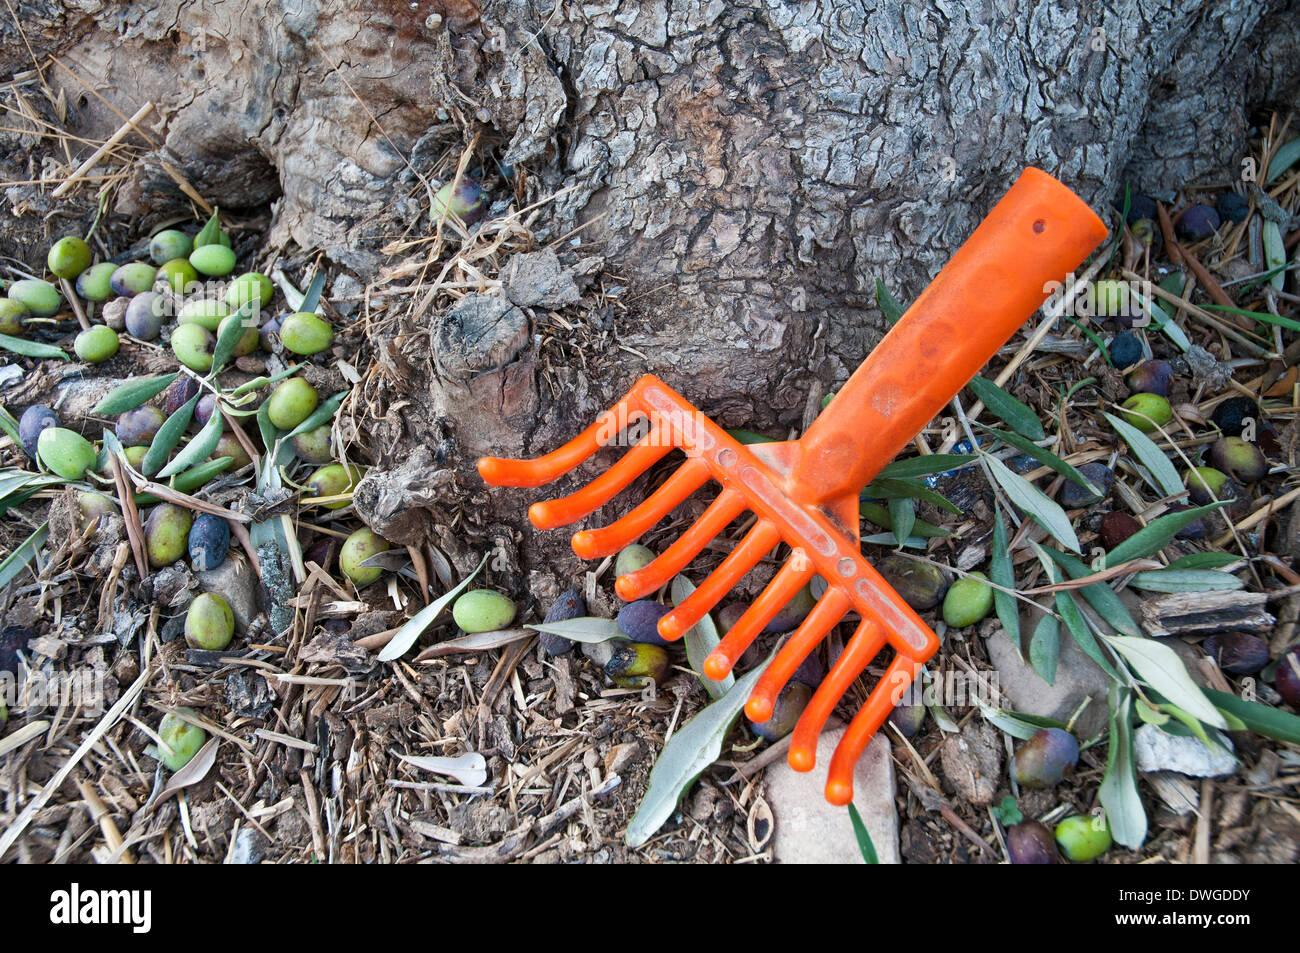 Olive harvesting tool - Stock Image